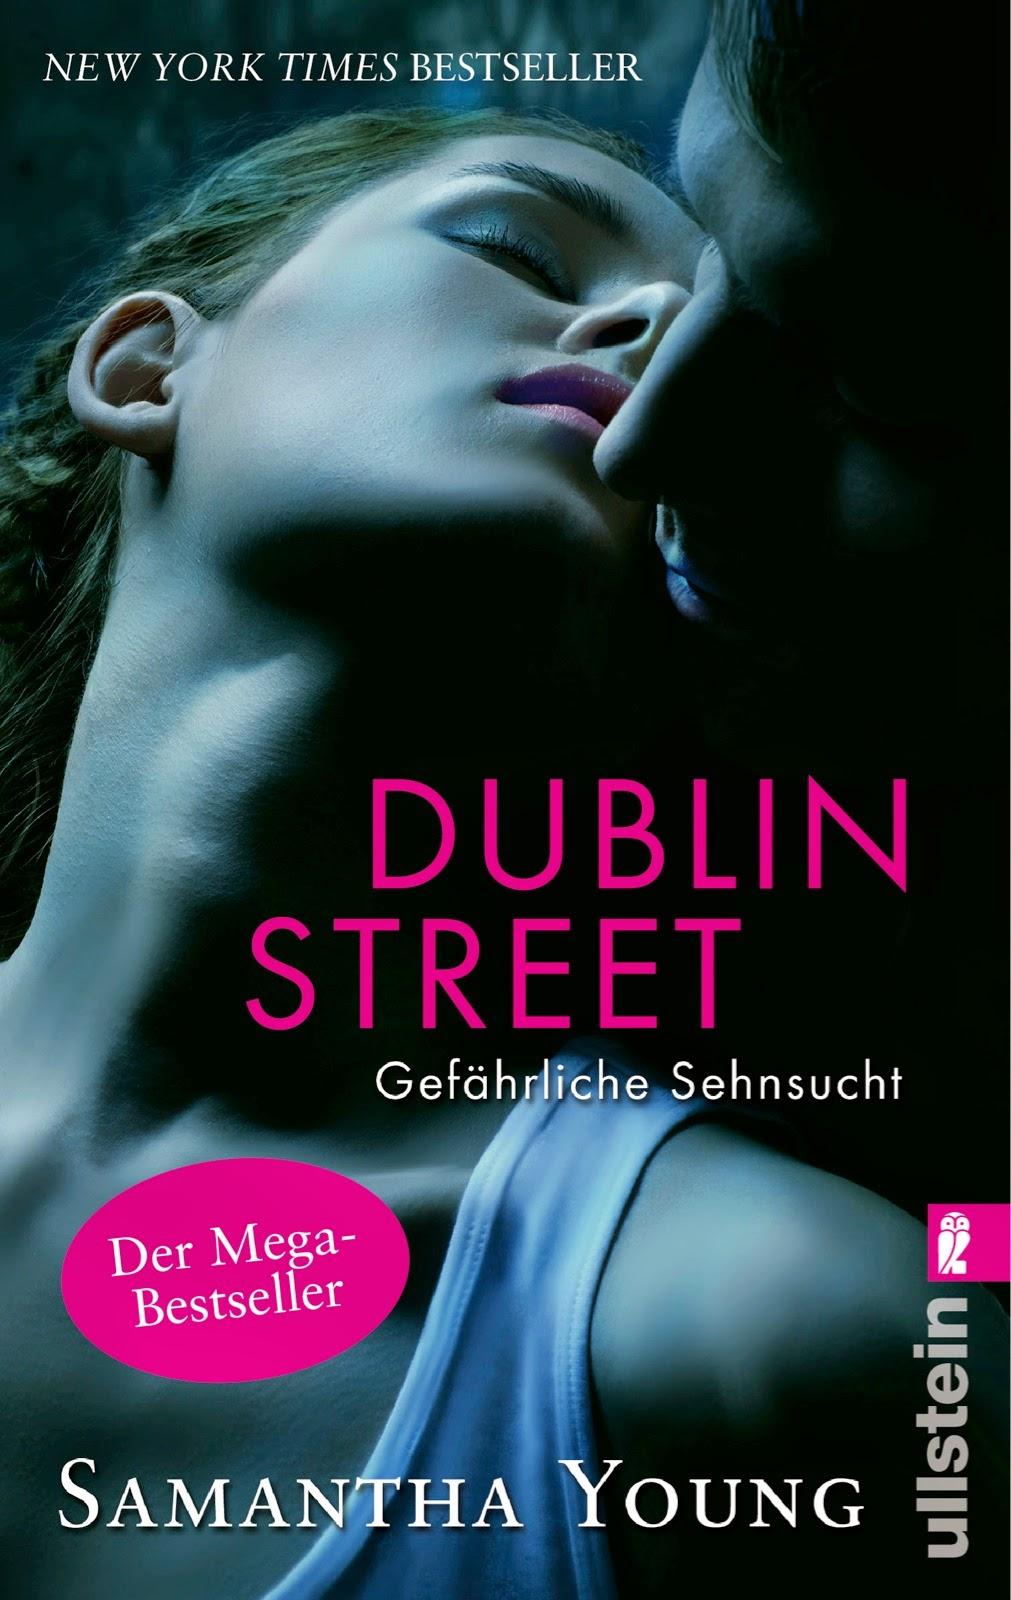 http://www.amazon.de/Dublin-Street-Gef%C3%A4hrliche-Sehnsucht-Edinburgh/dp/3548285678/ref=sr_1_1_bnp_1_pap?ie=UTF8&qid=1399880134&sr=8-1&keywords=dublin+street